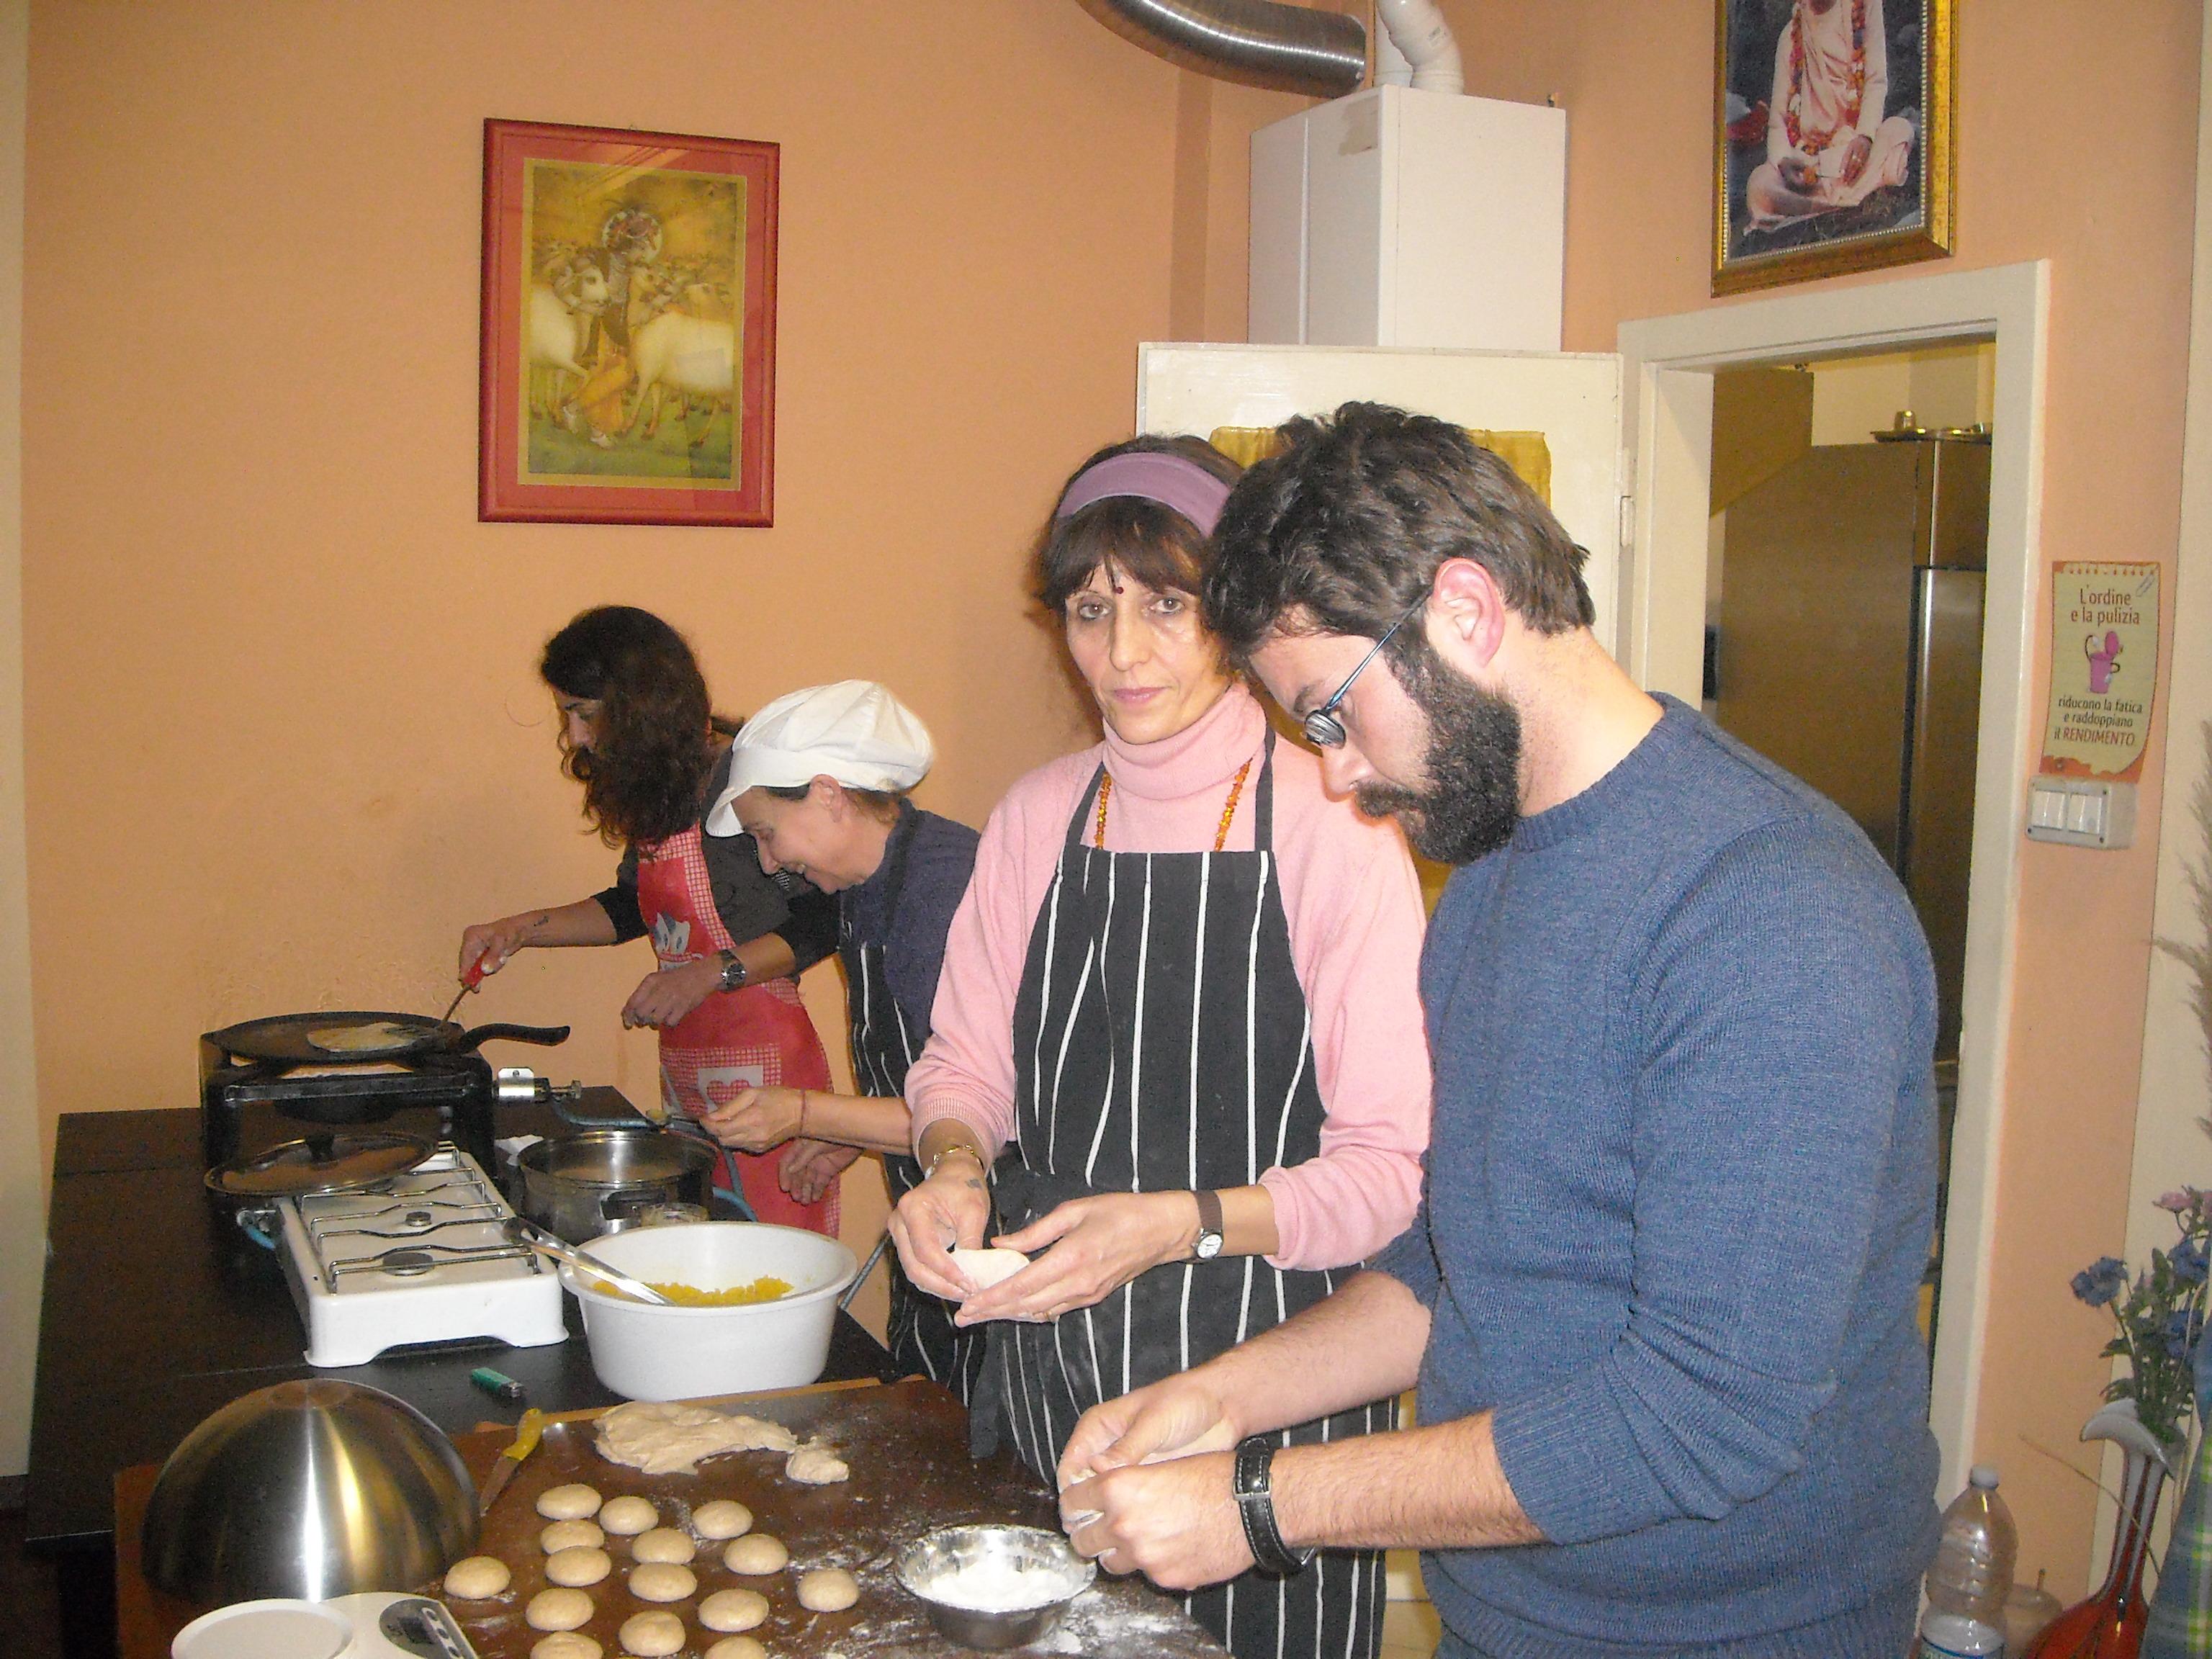 Il corso di cucina vegetariana e vegana corsi di cucina vegetariana e vegana a bologna - Corso di cucina bologna ...